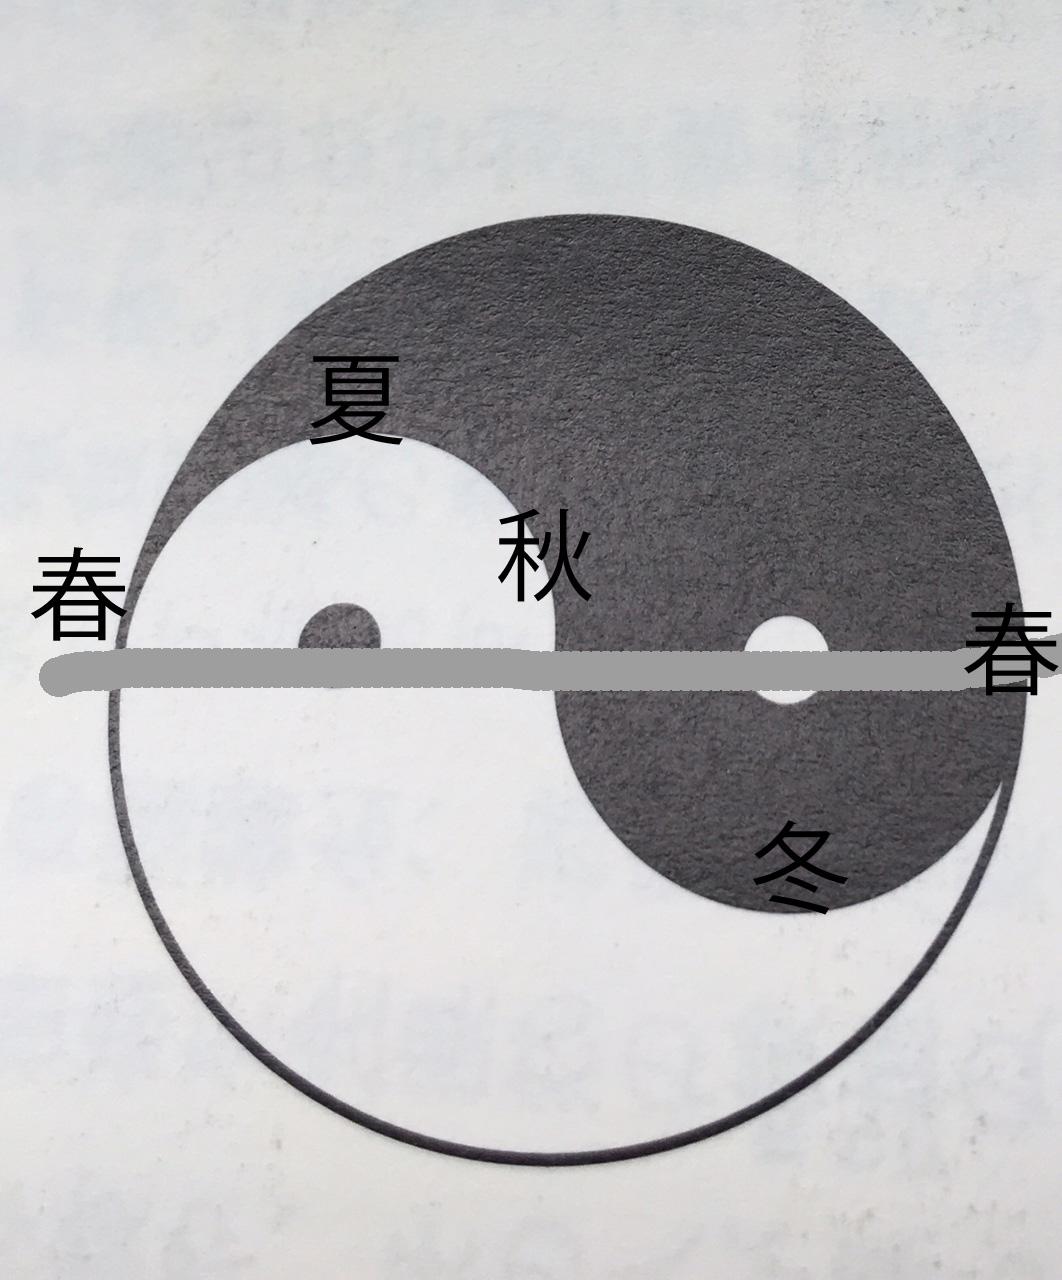 大極図の意味 http://www.ankh-jp.com